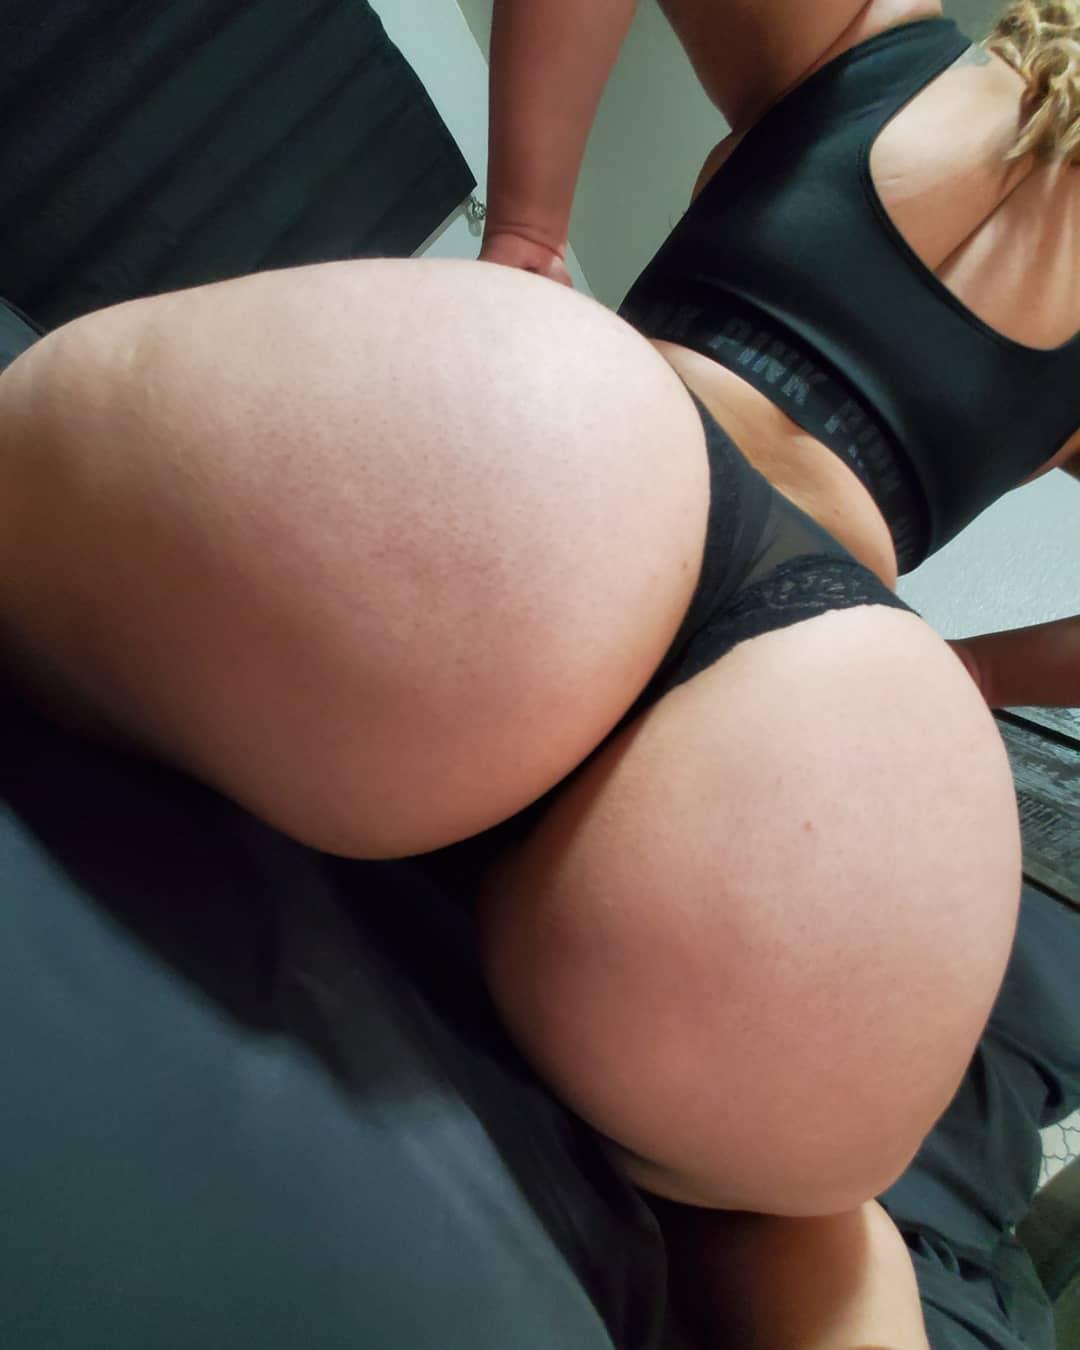 Boricuabootyy Nude & Sex Tape Onlyfans Leaked! 0021